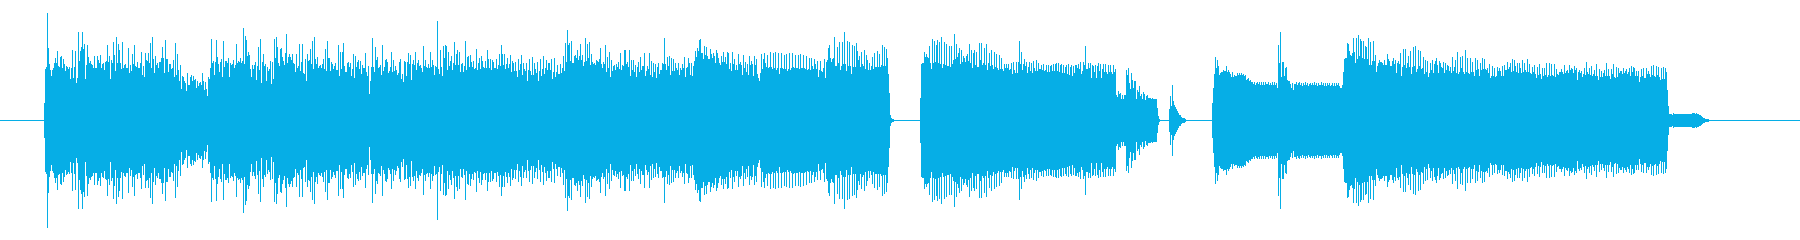 NES アクションC10-3(クリア1)の再生済みの波形